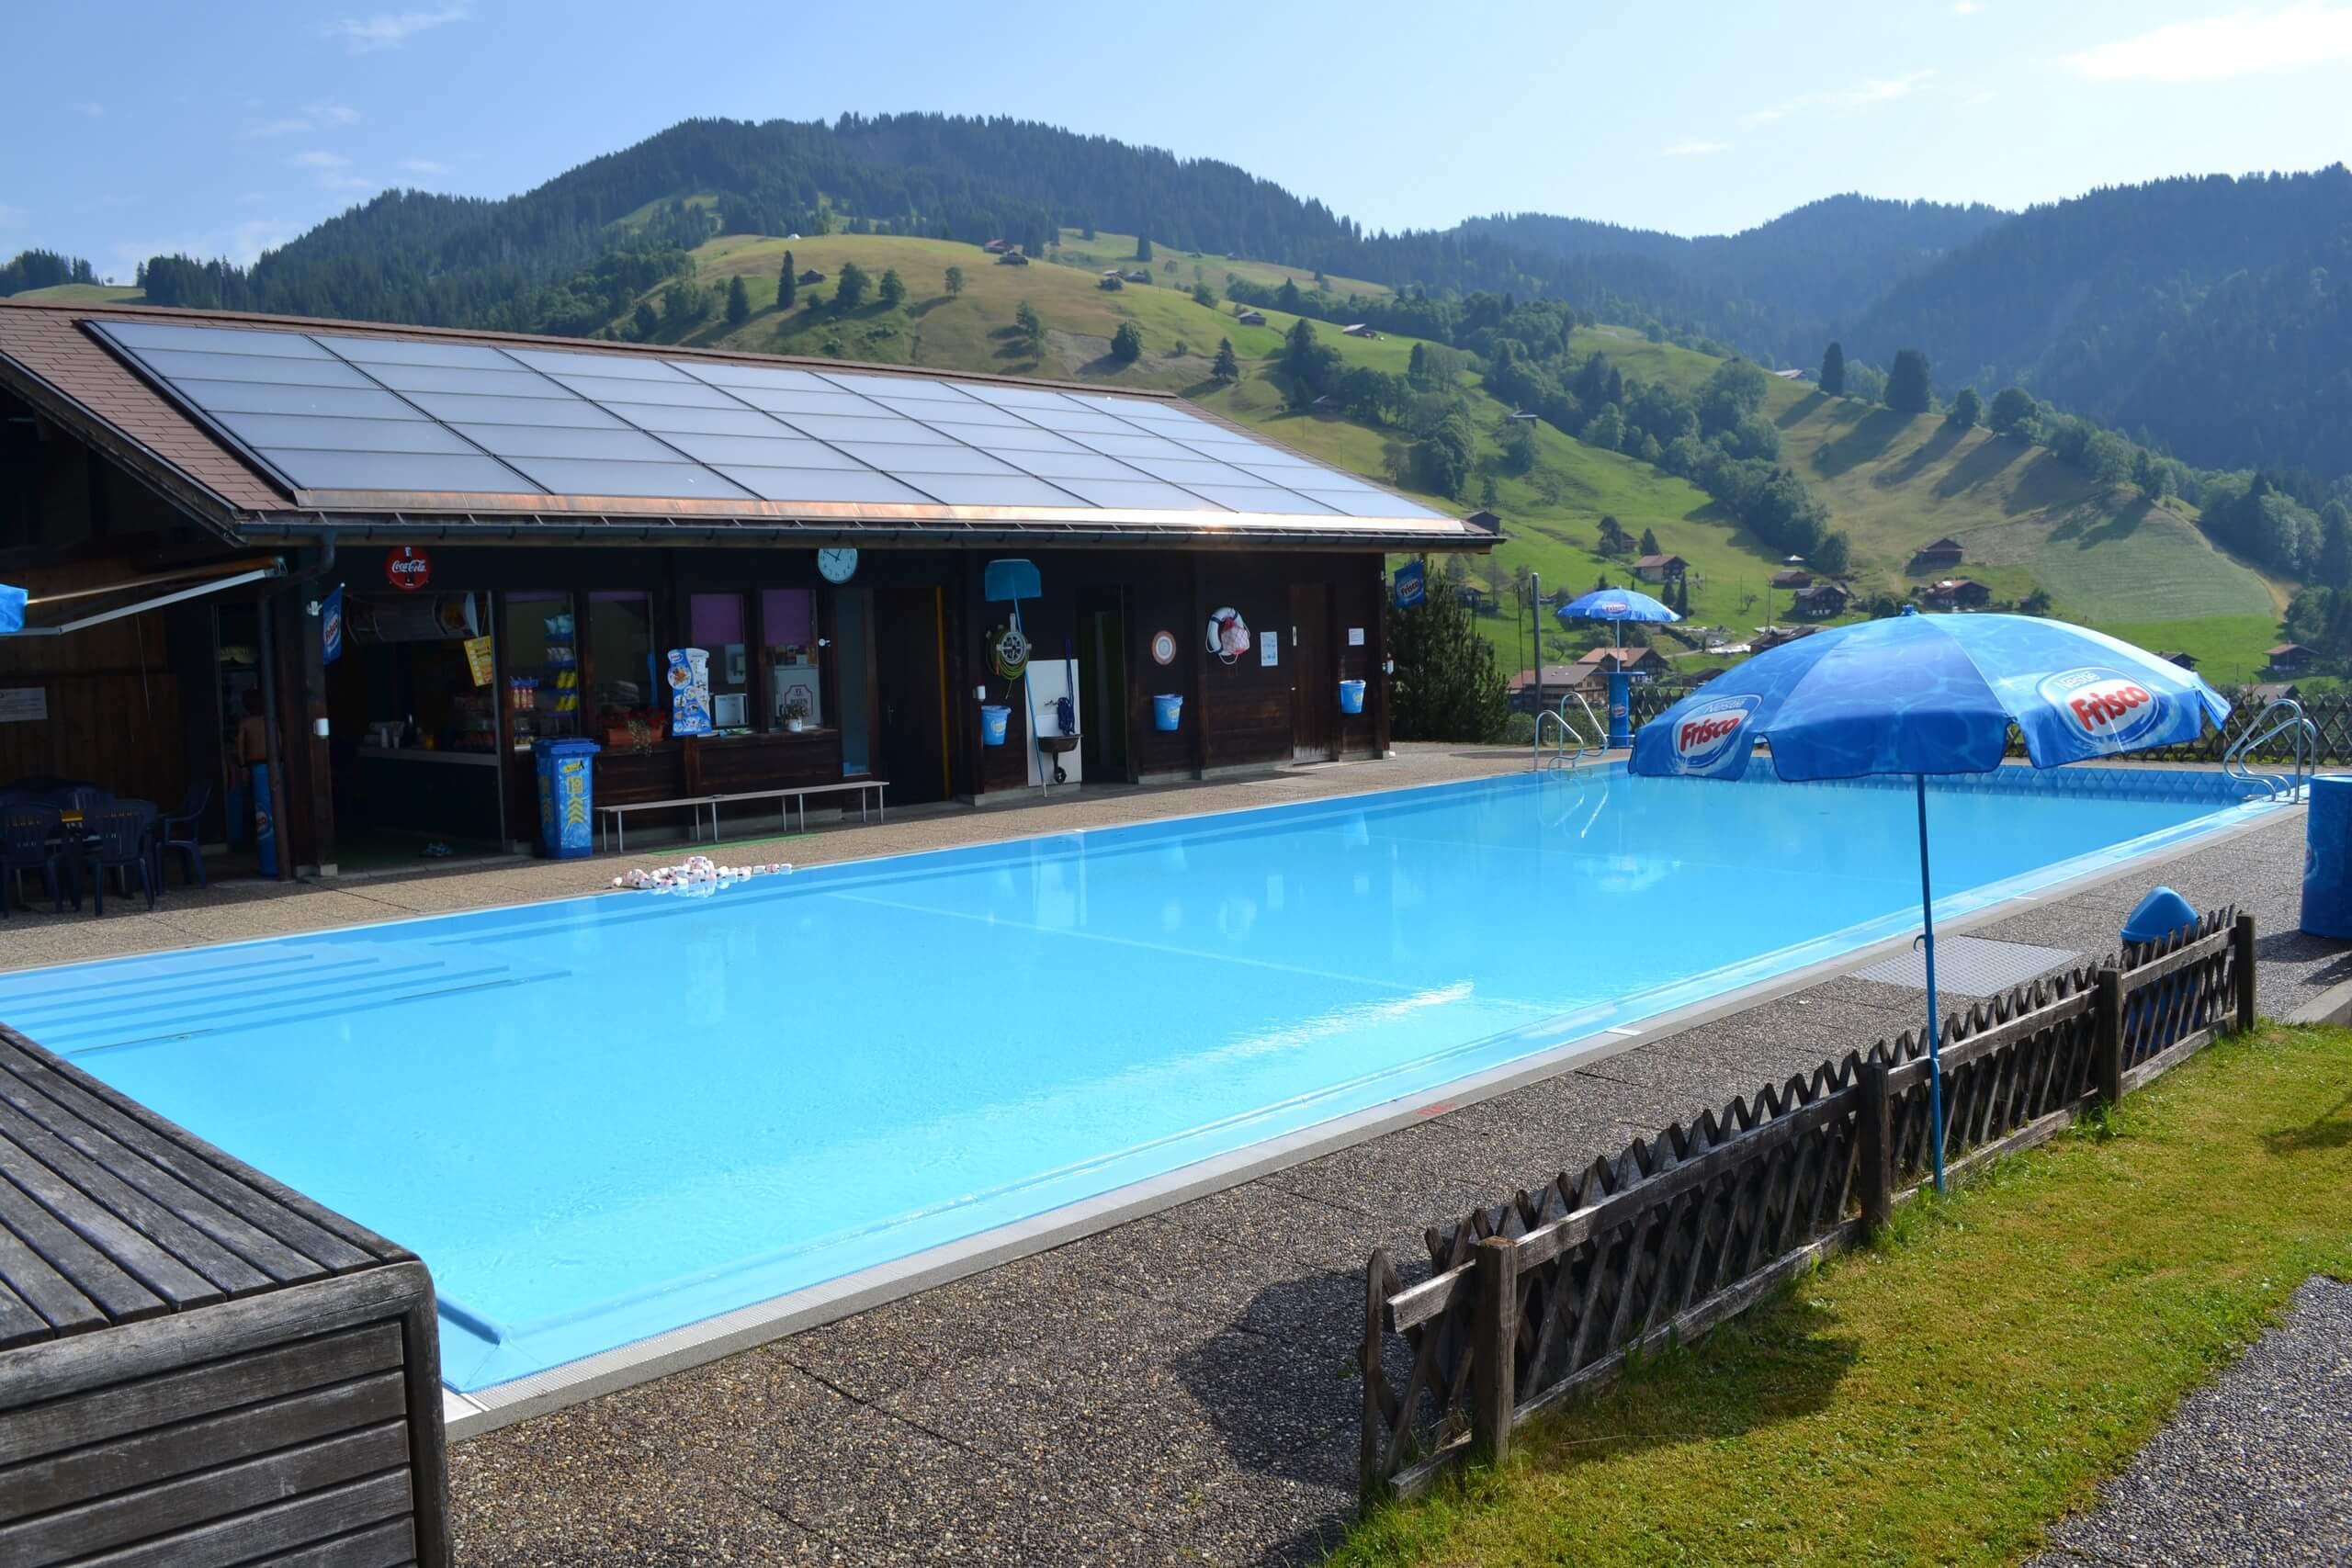 habkern-schwimmbad-freiluft-sommer-panorama-naturidylle